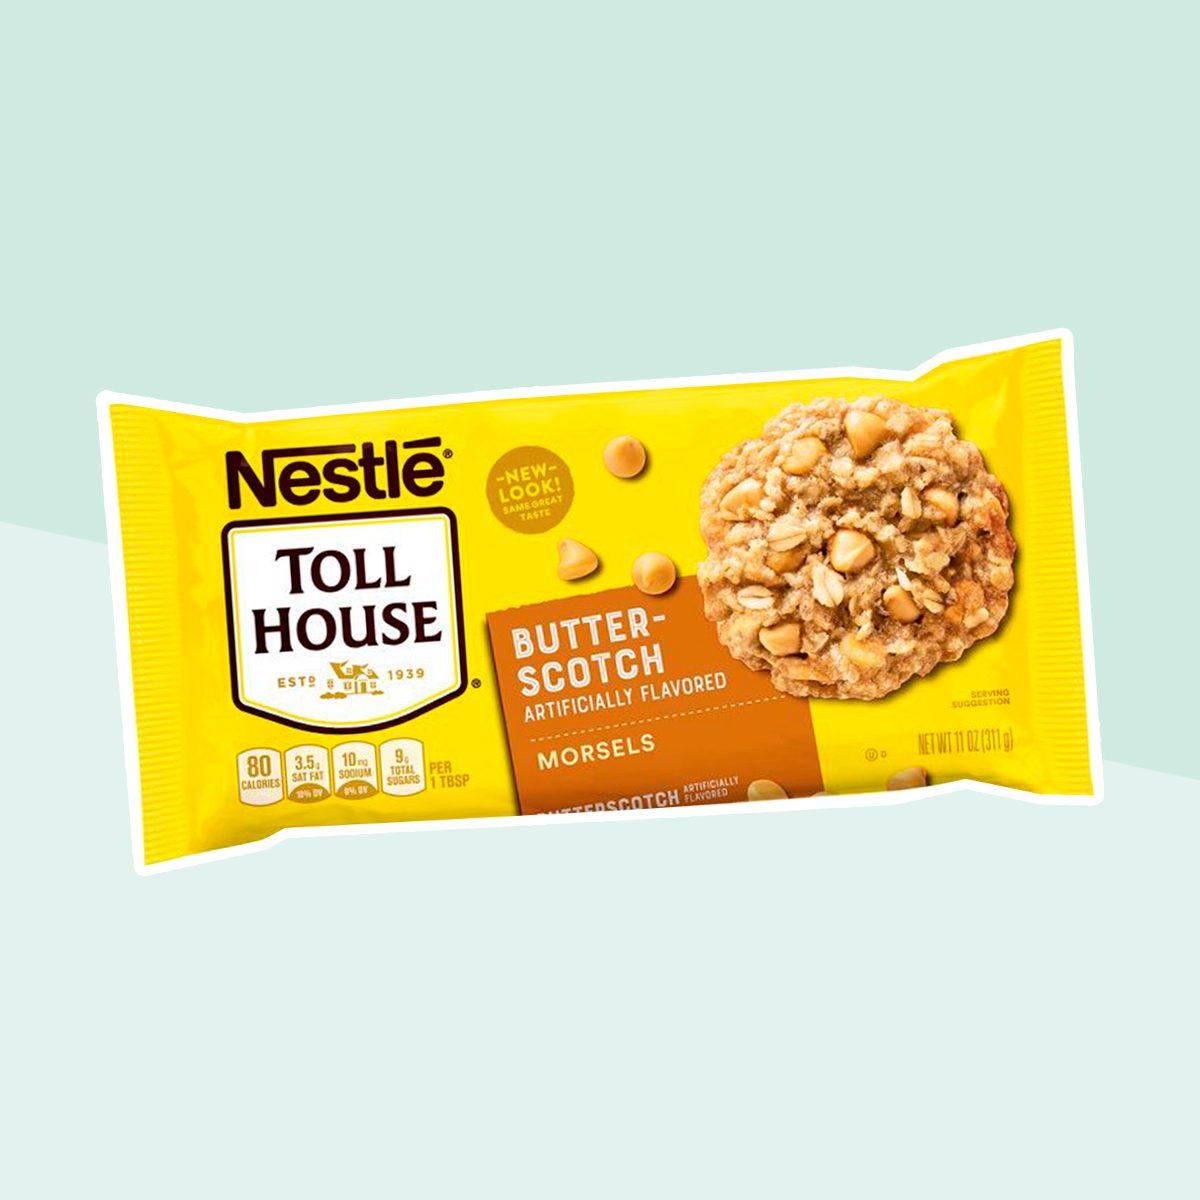 Nestlé Toll House Butterscotch Chips